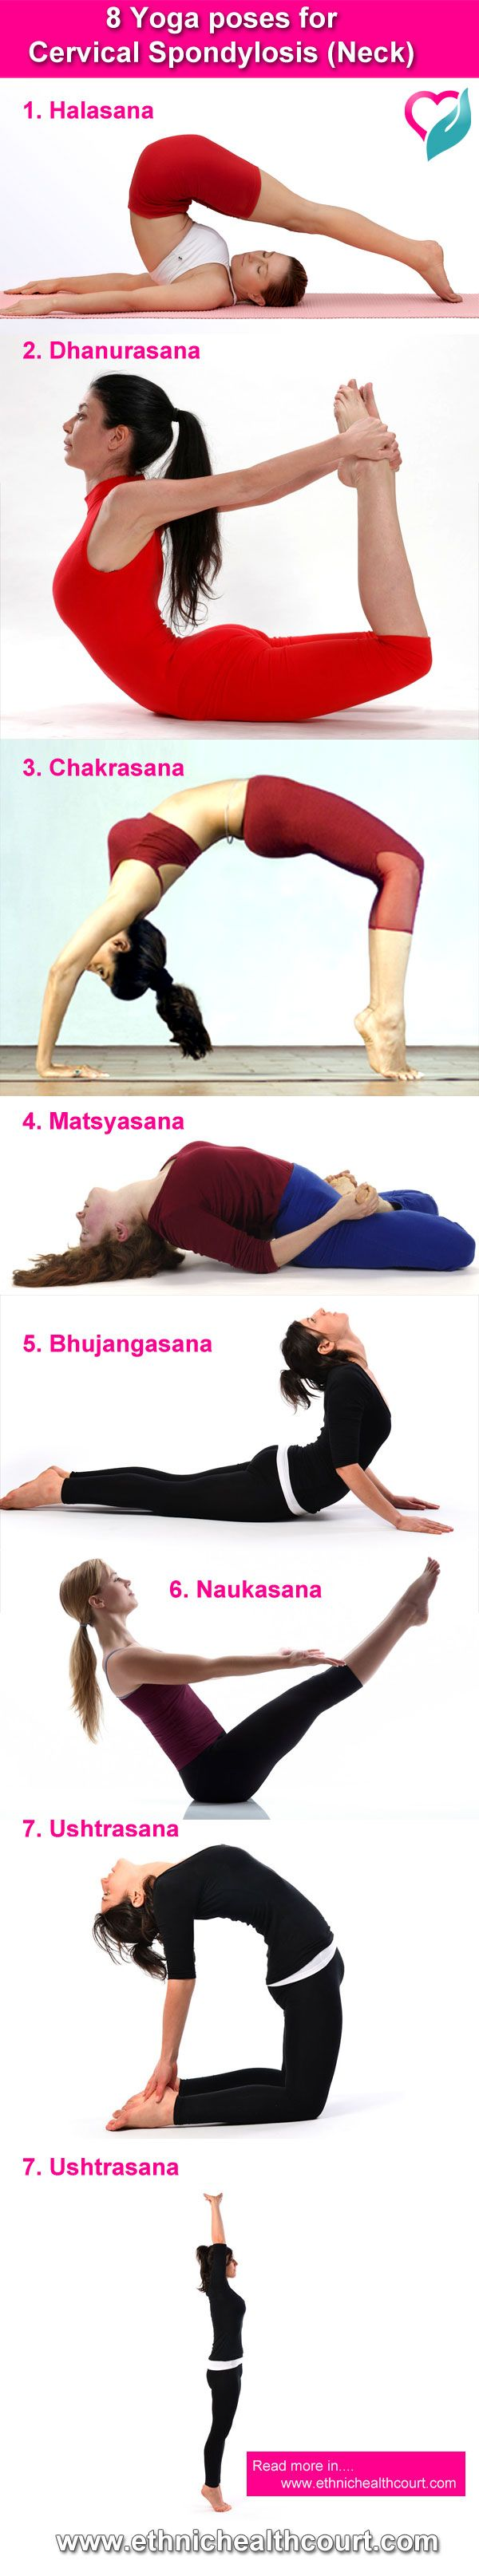 Pin by Ethnic Health on Yoga | Yoga fitness, Yoga poses ...